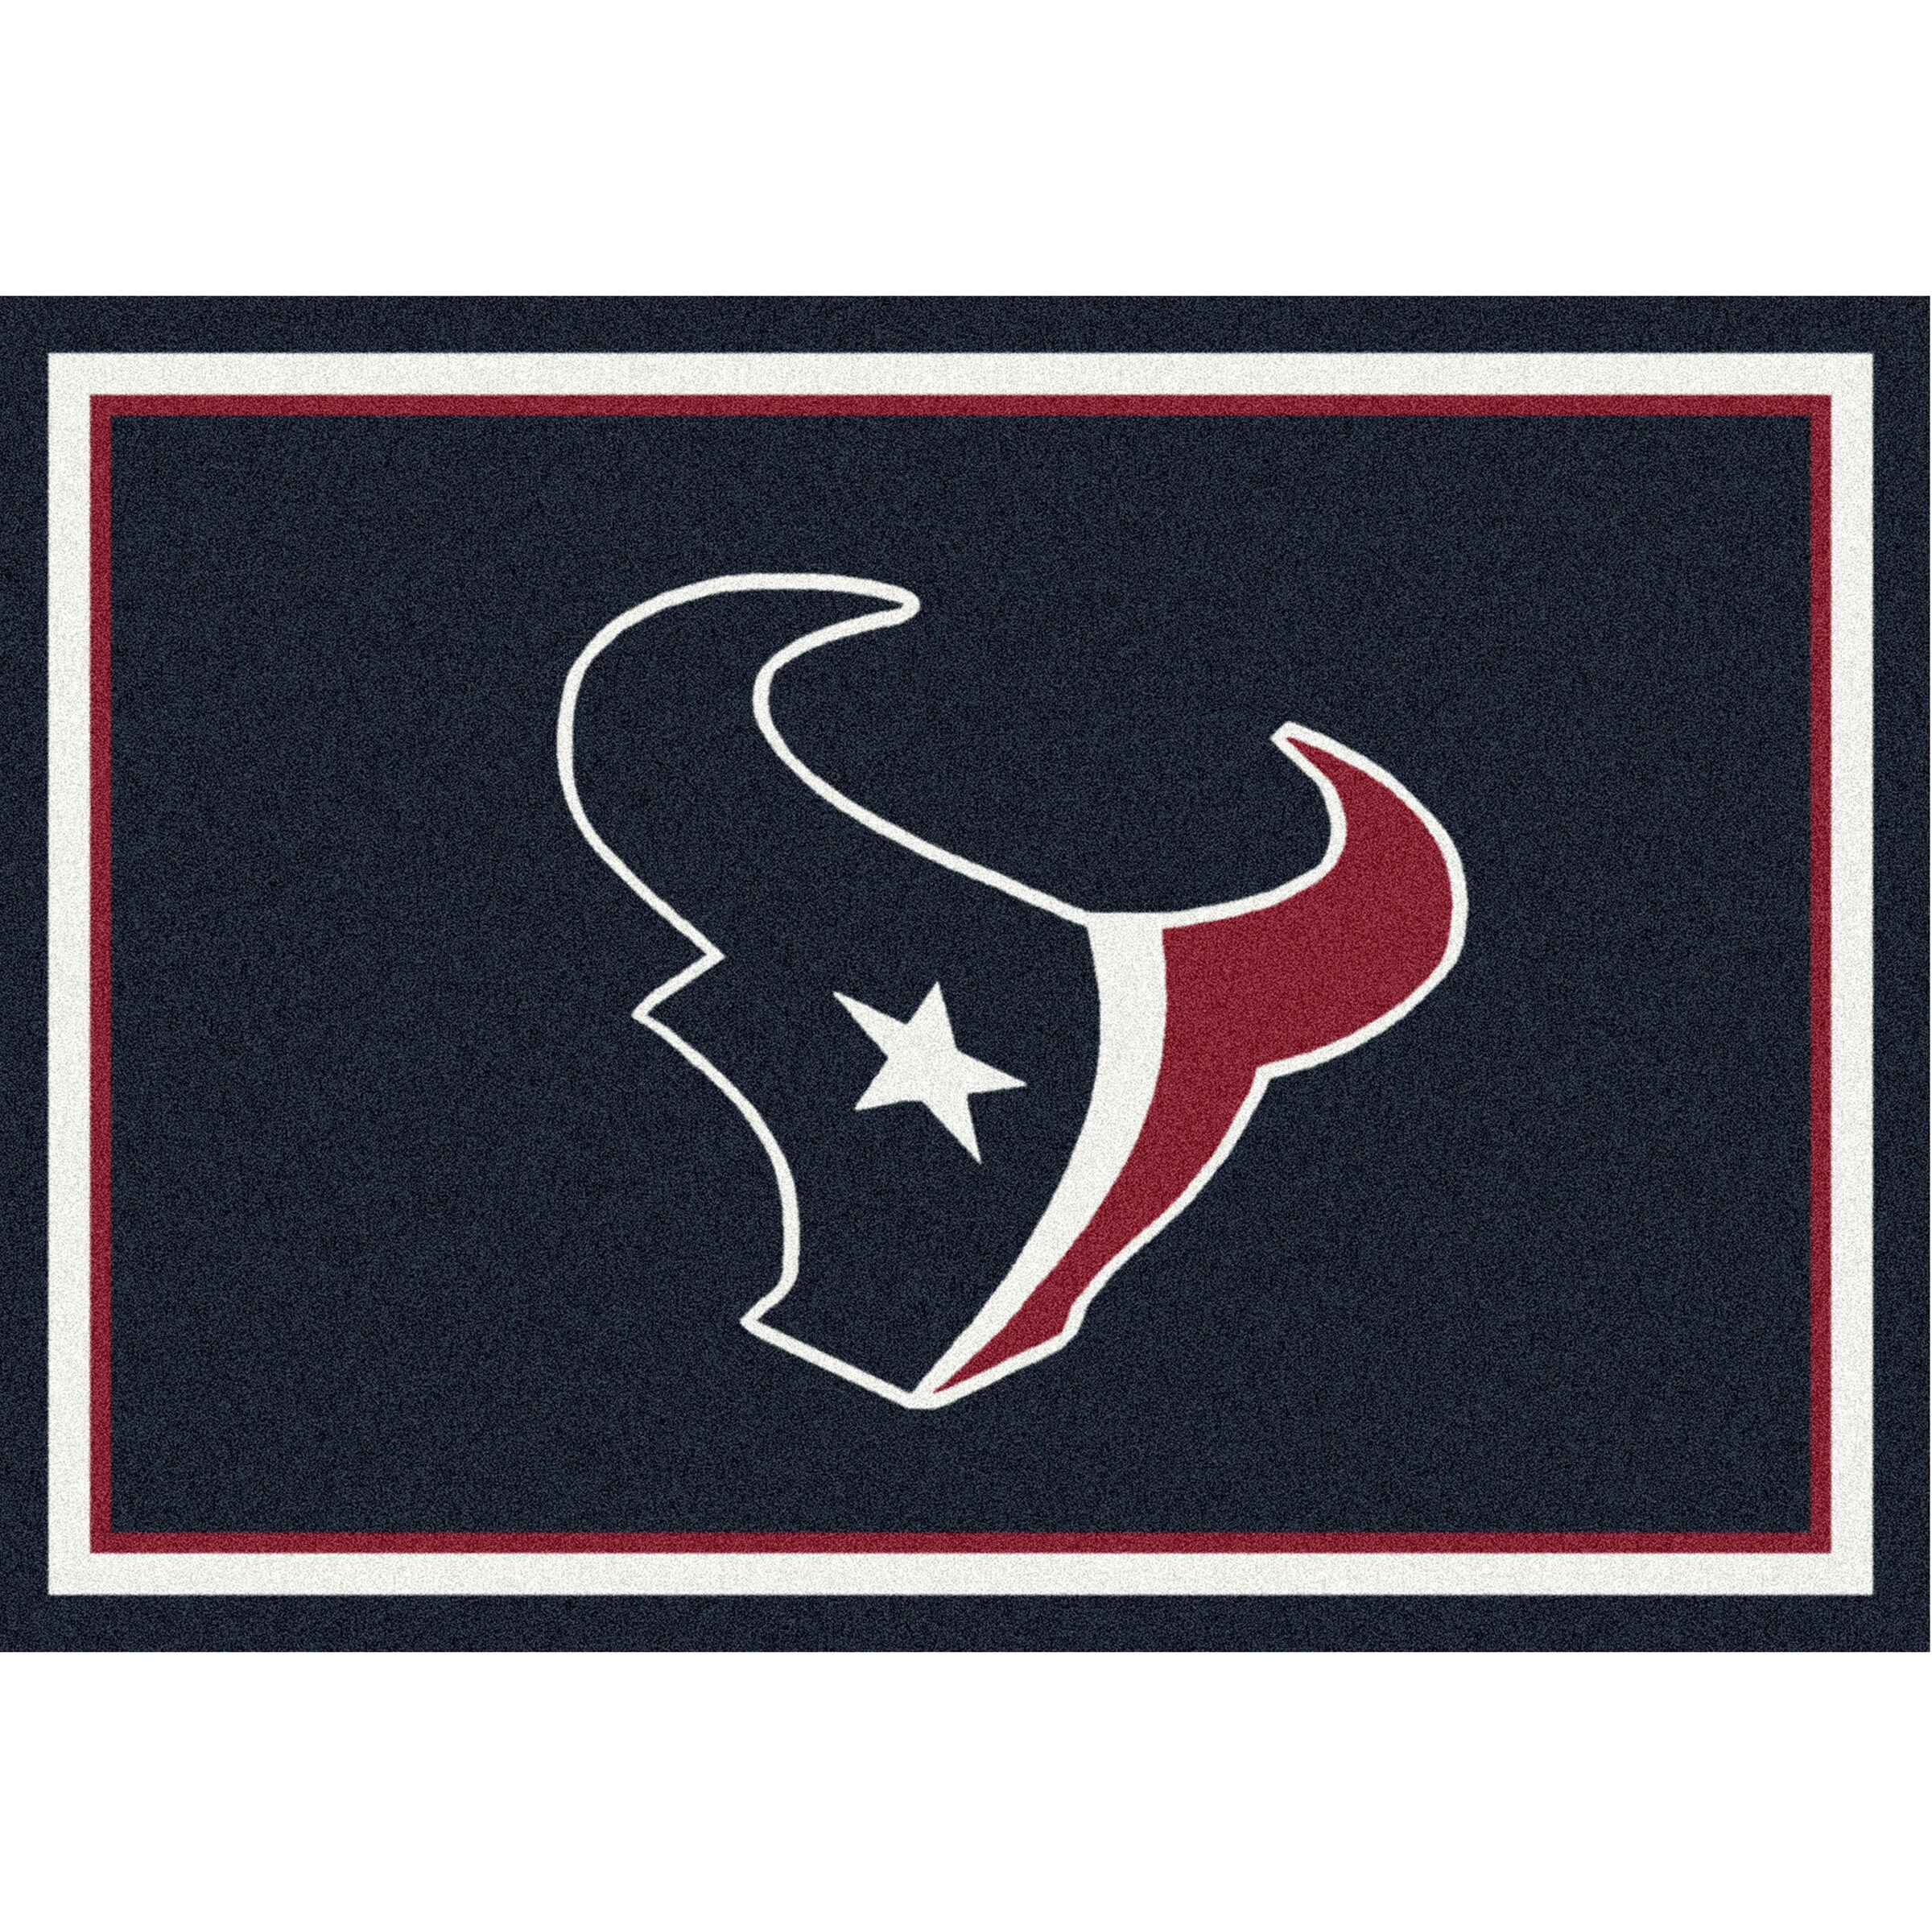 Houston Texans Imperial 6' x 8' Spirit Rug